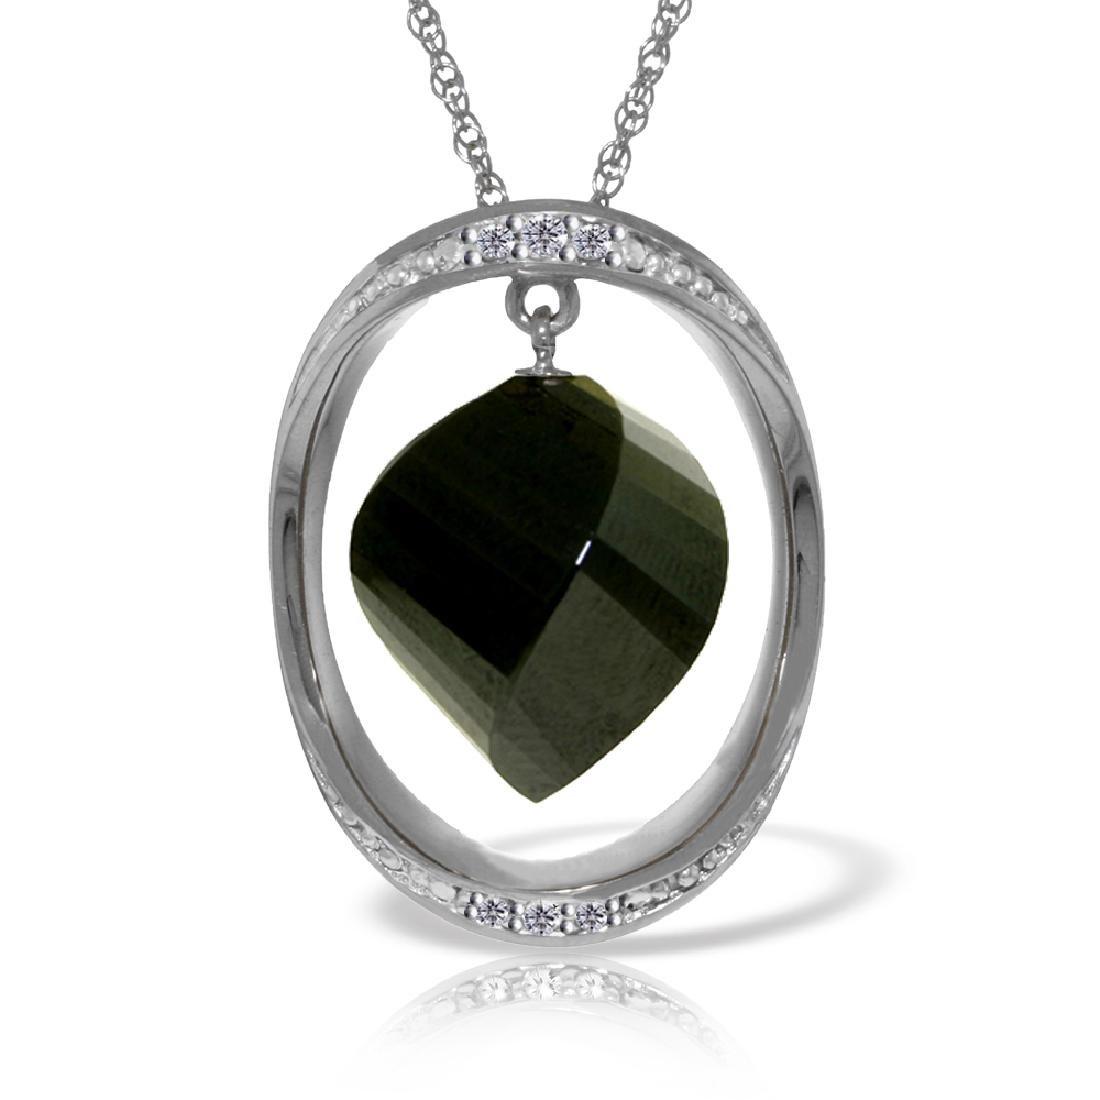 Genuine 15.6 ctw Black Spinel & Diamond Necklace